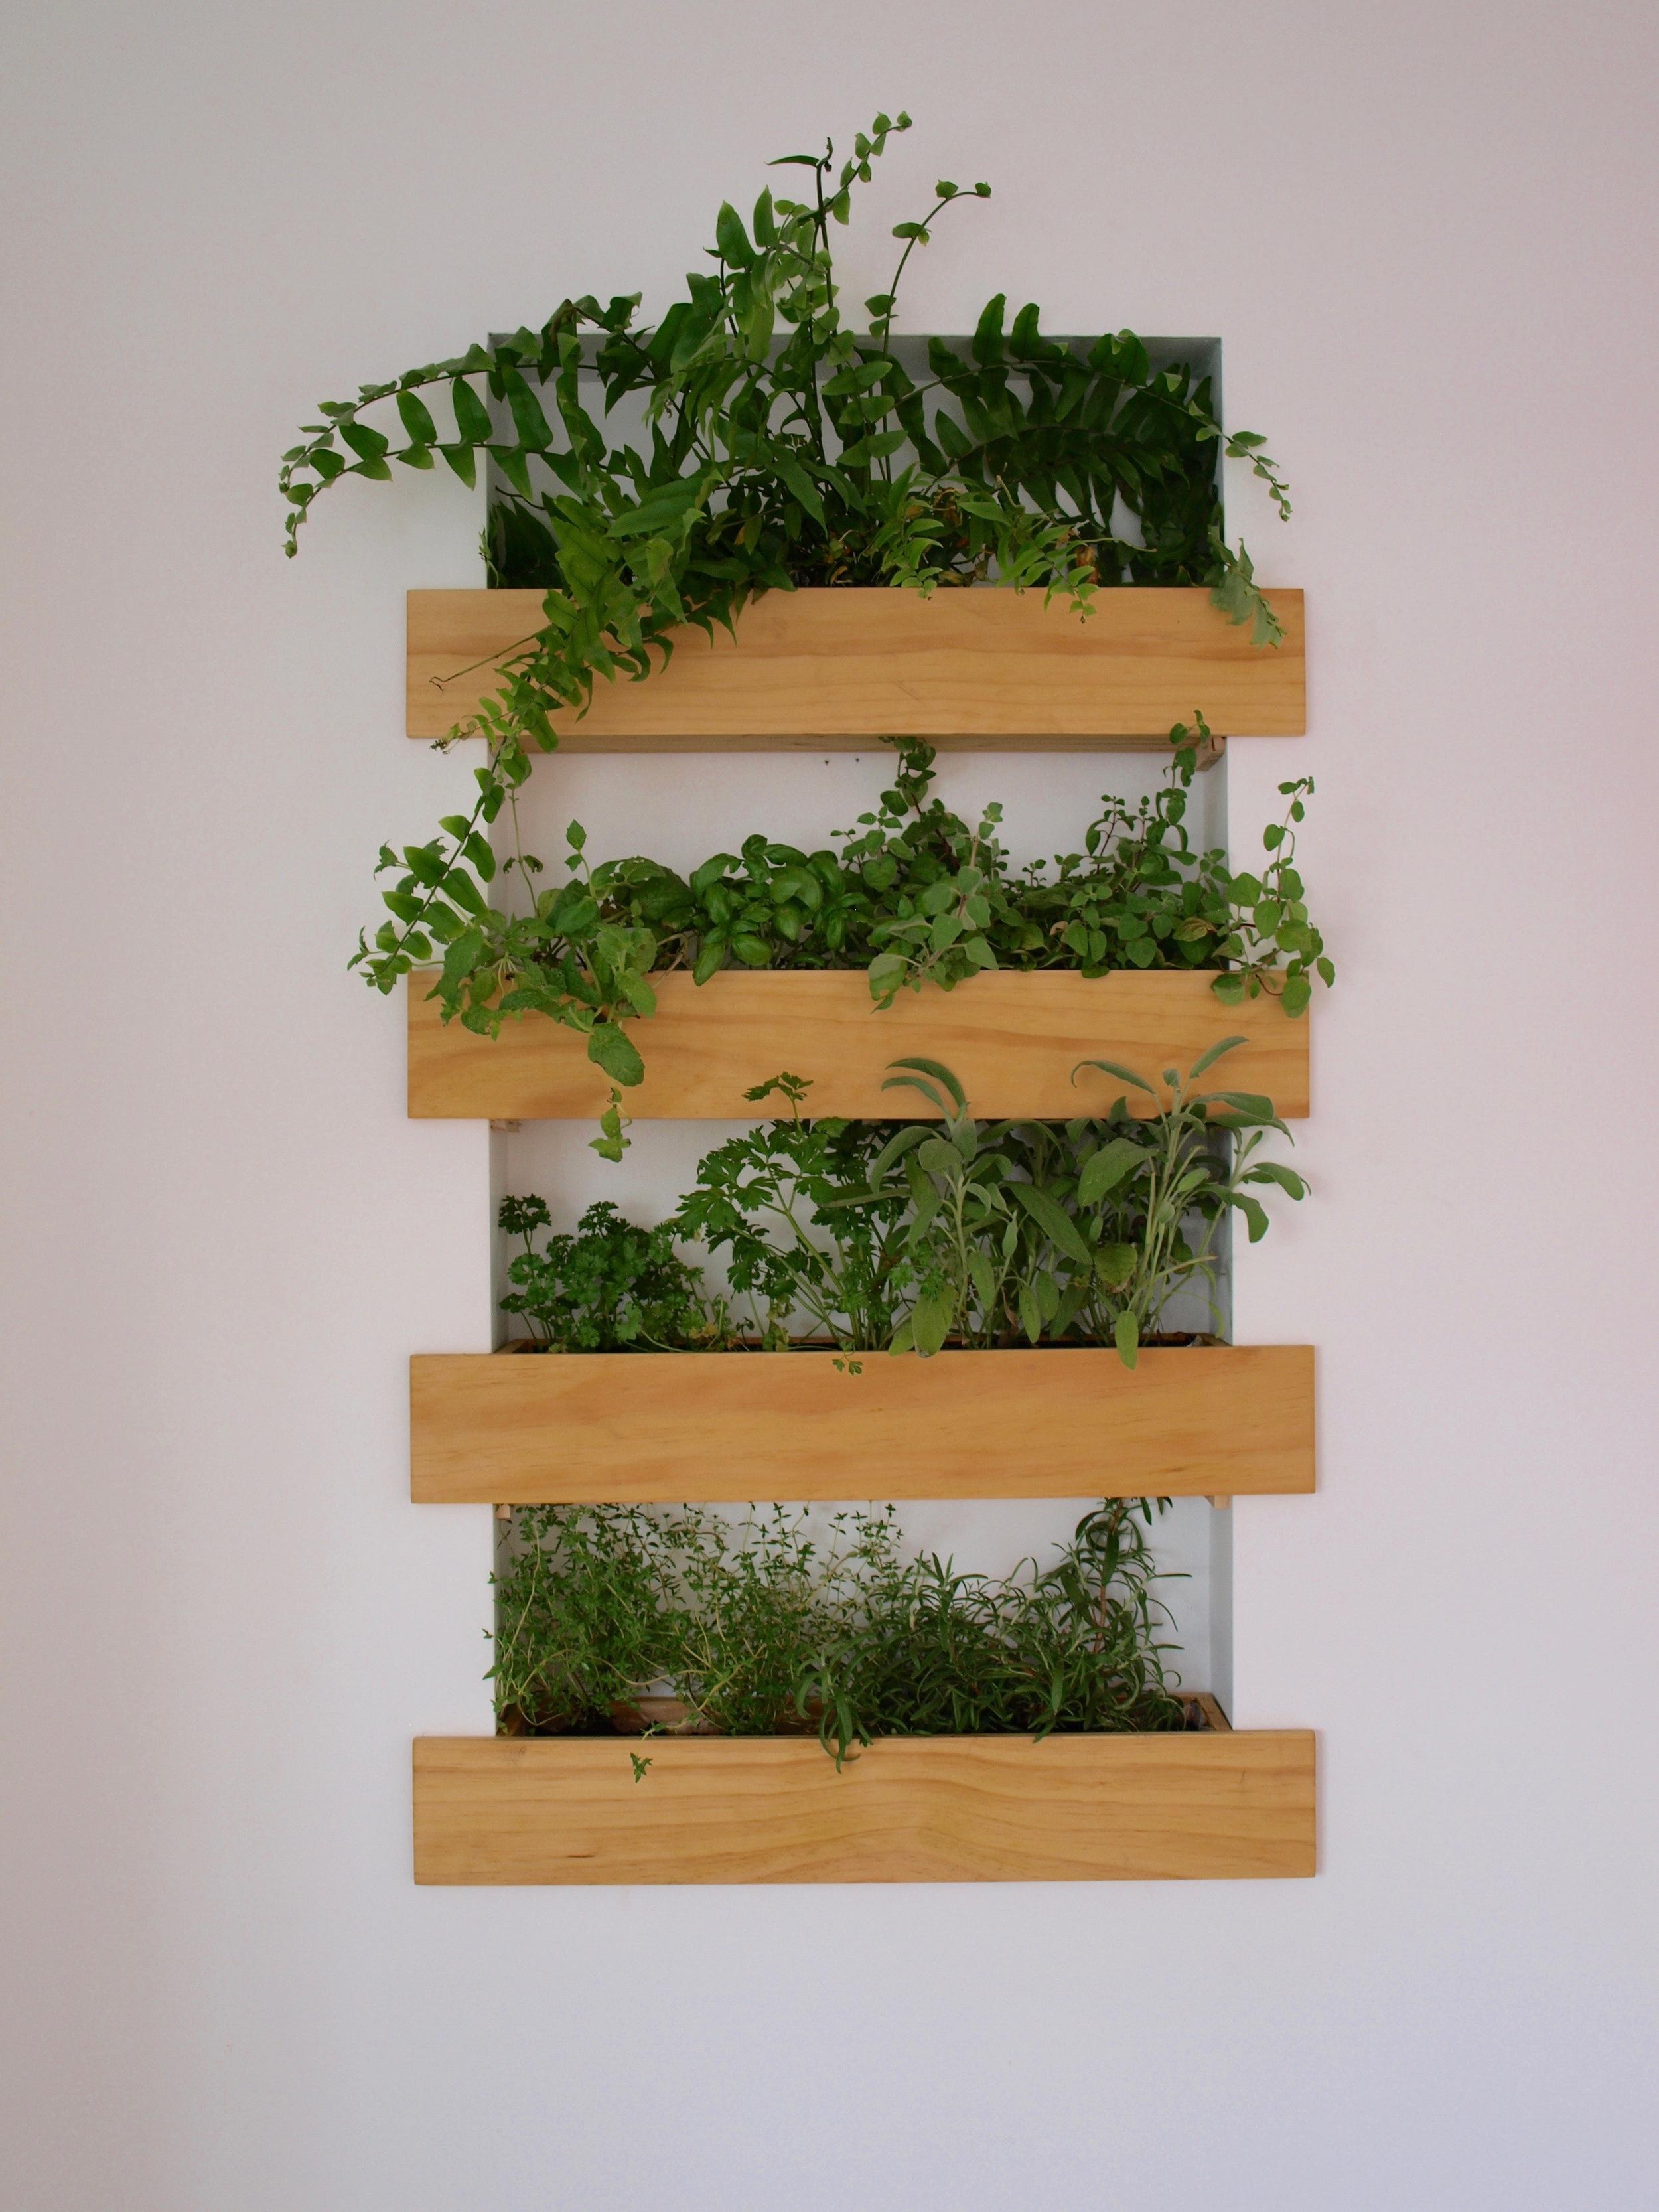 Hanging Room Plants